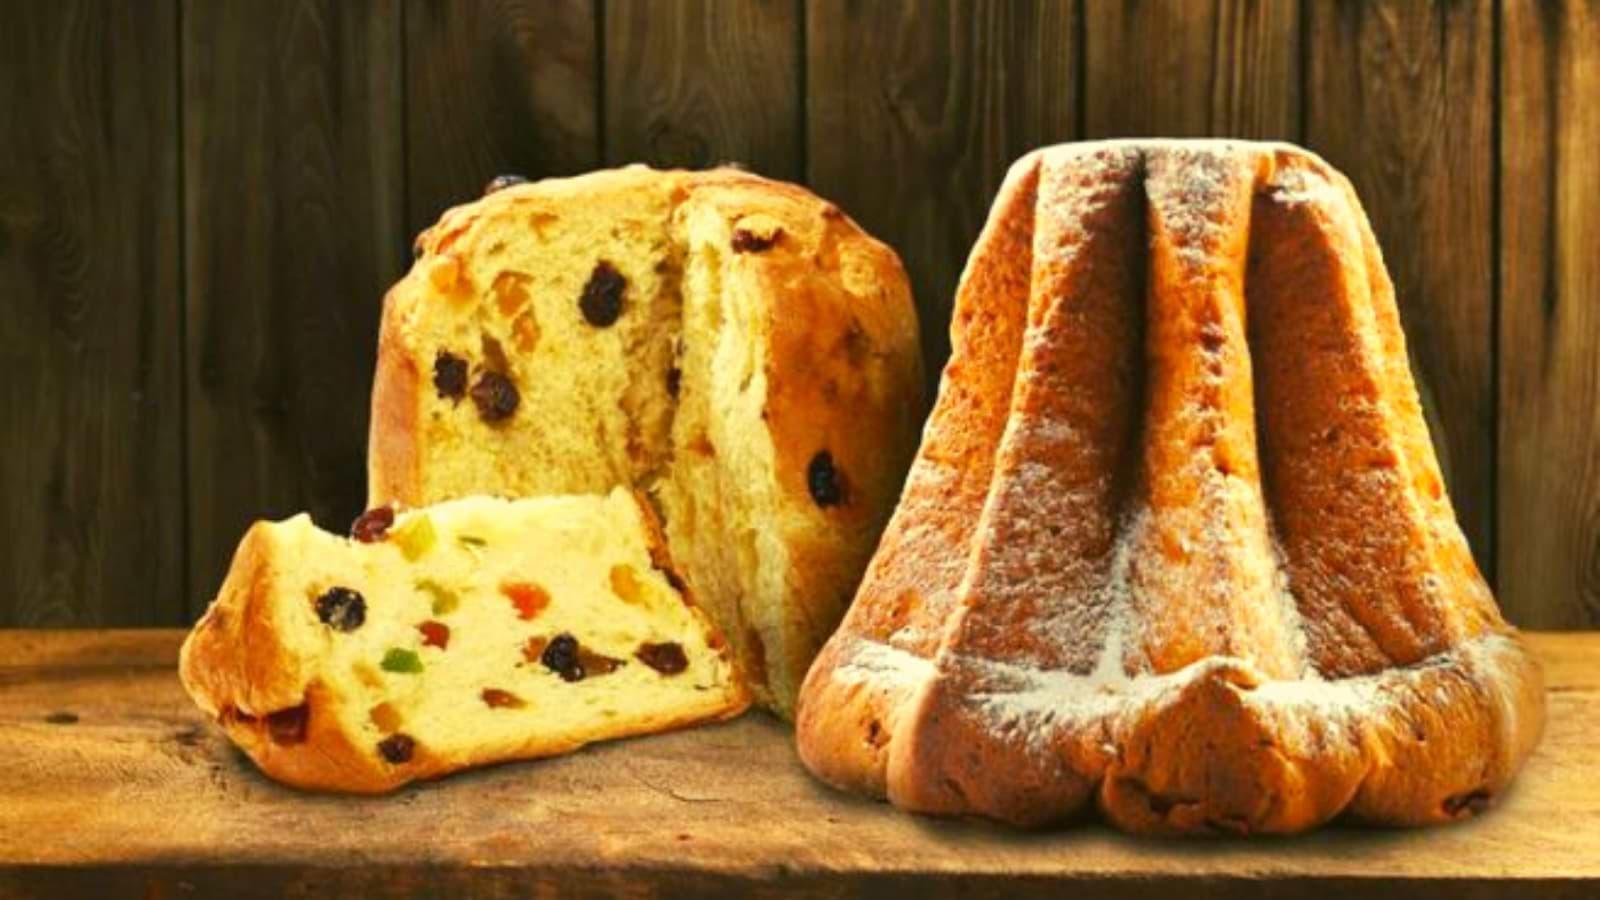 The Authentic Pandoro Cake by Italians